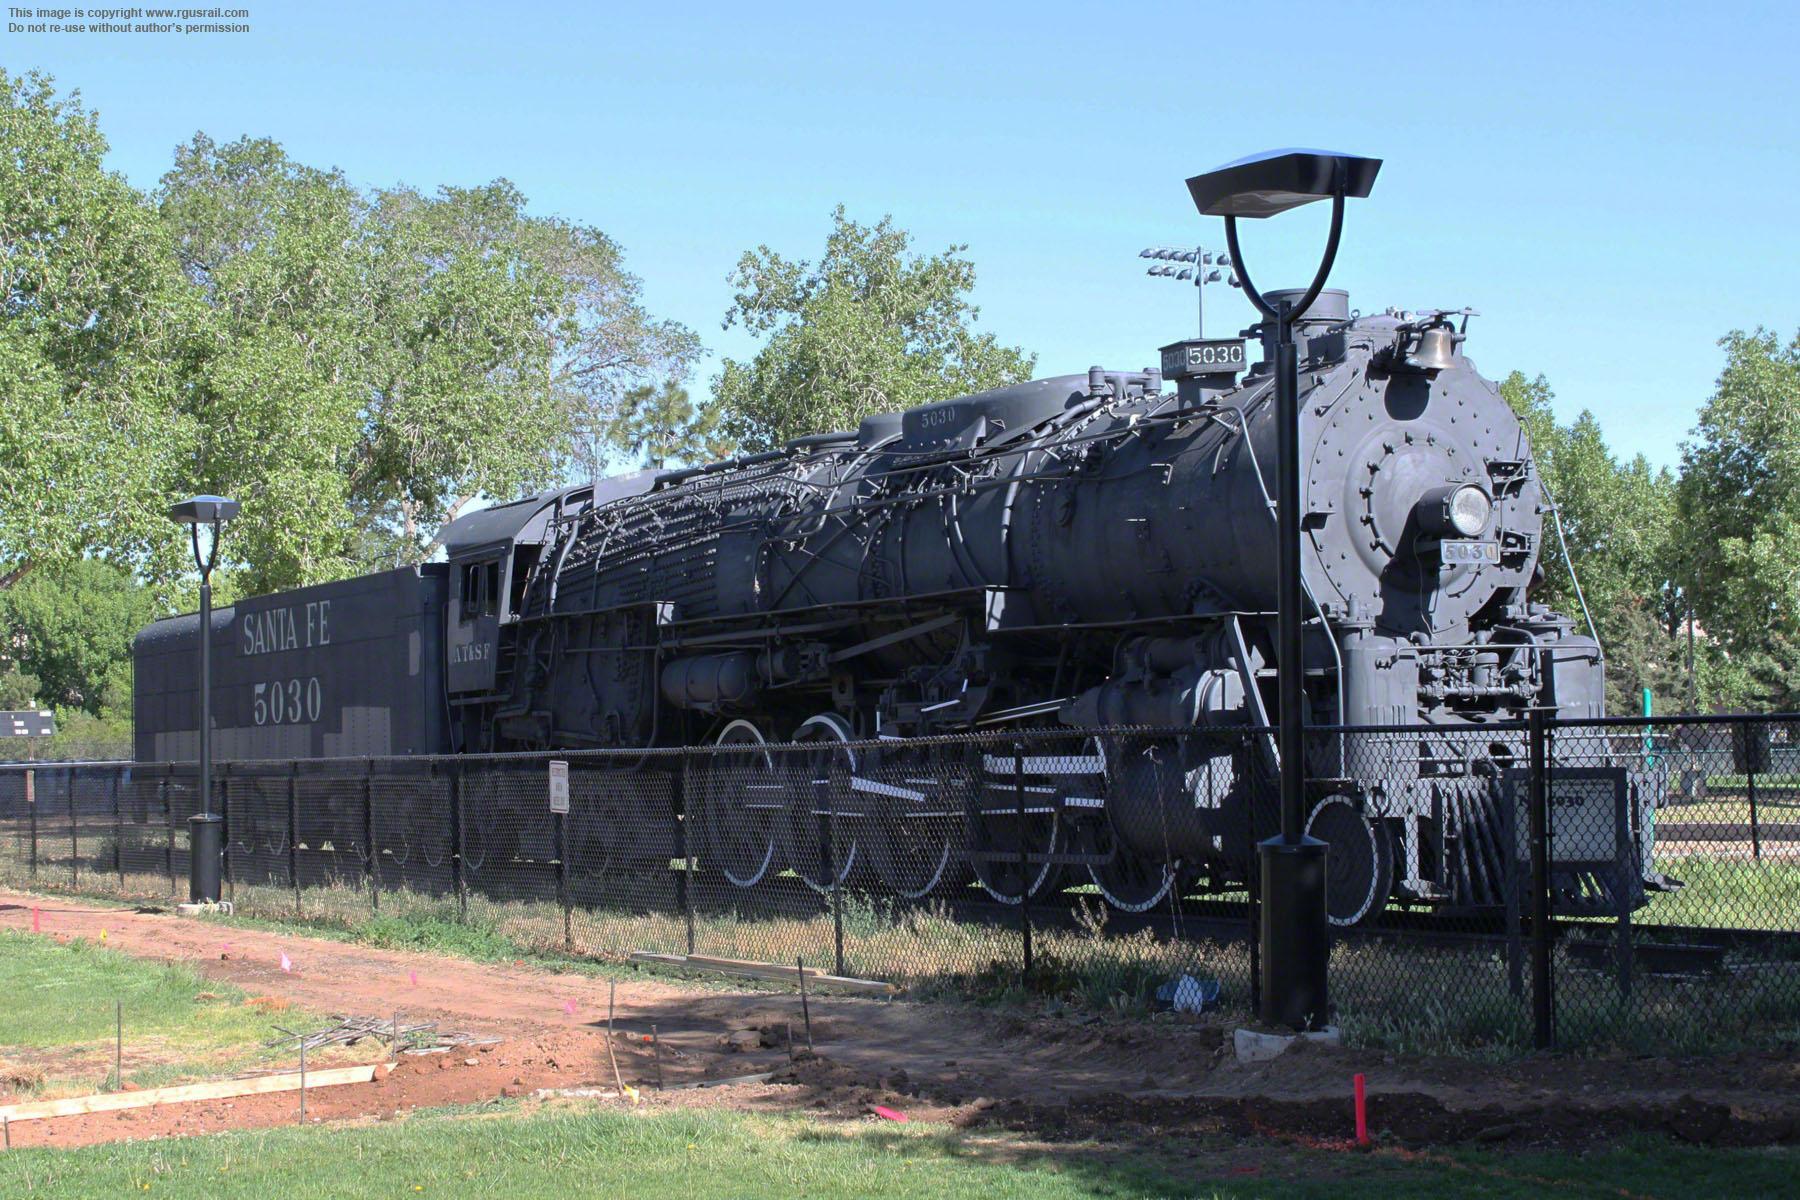 17-08-12 Atchison, Topeka & Santa Fe Railroad 2-10-4 5030 … | Flickr